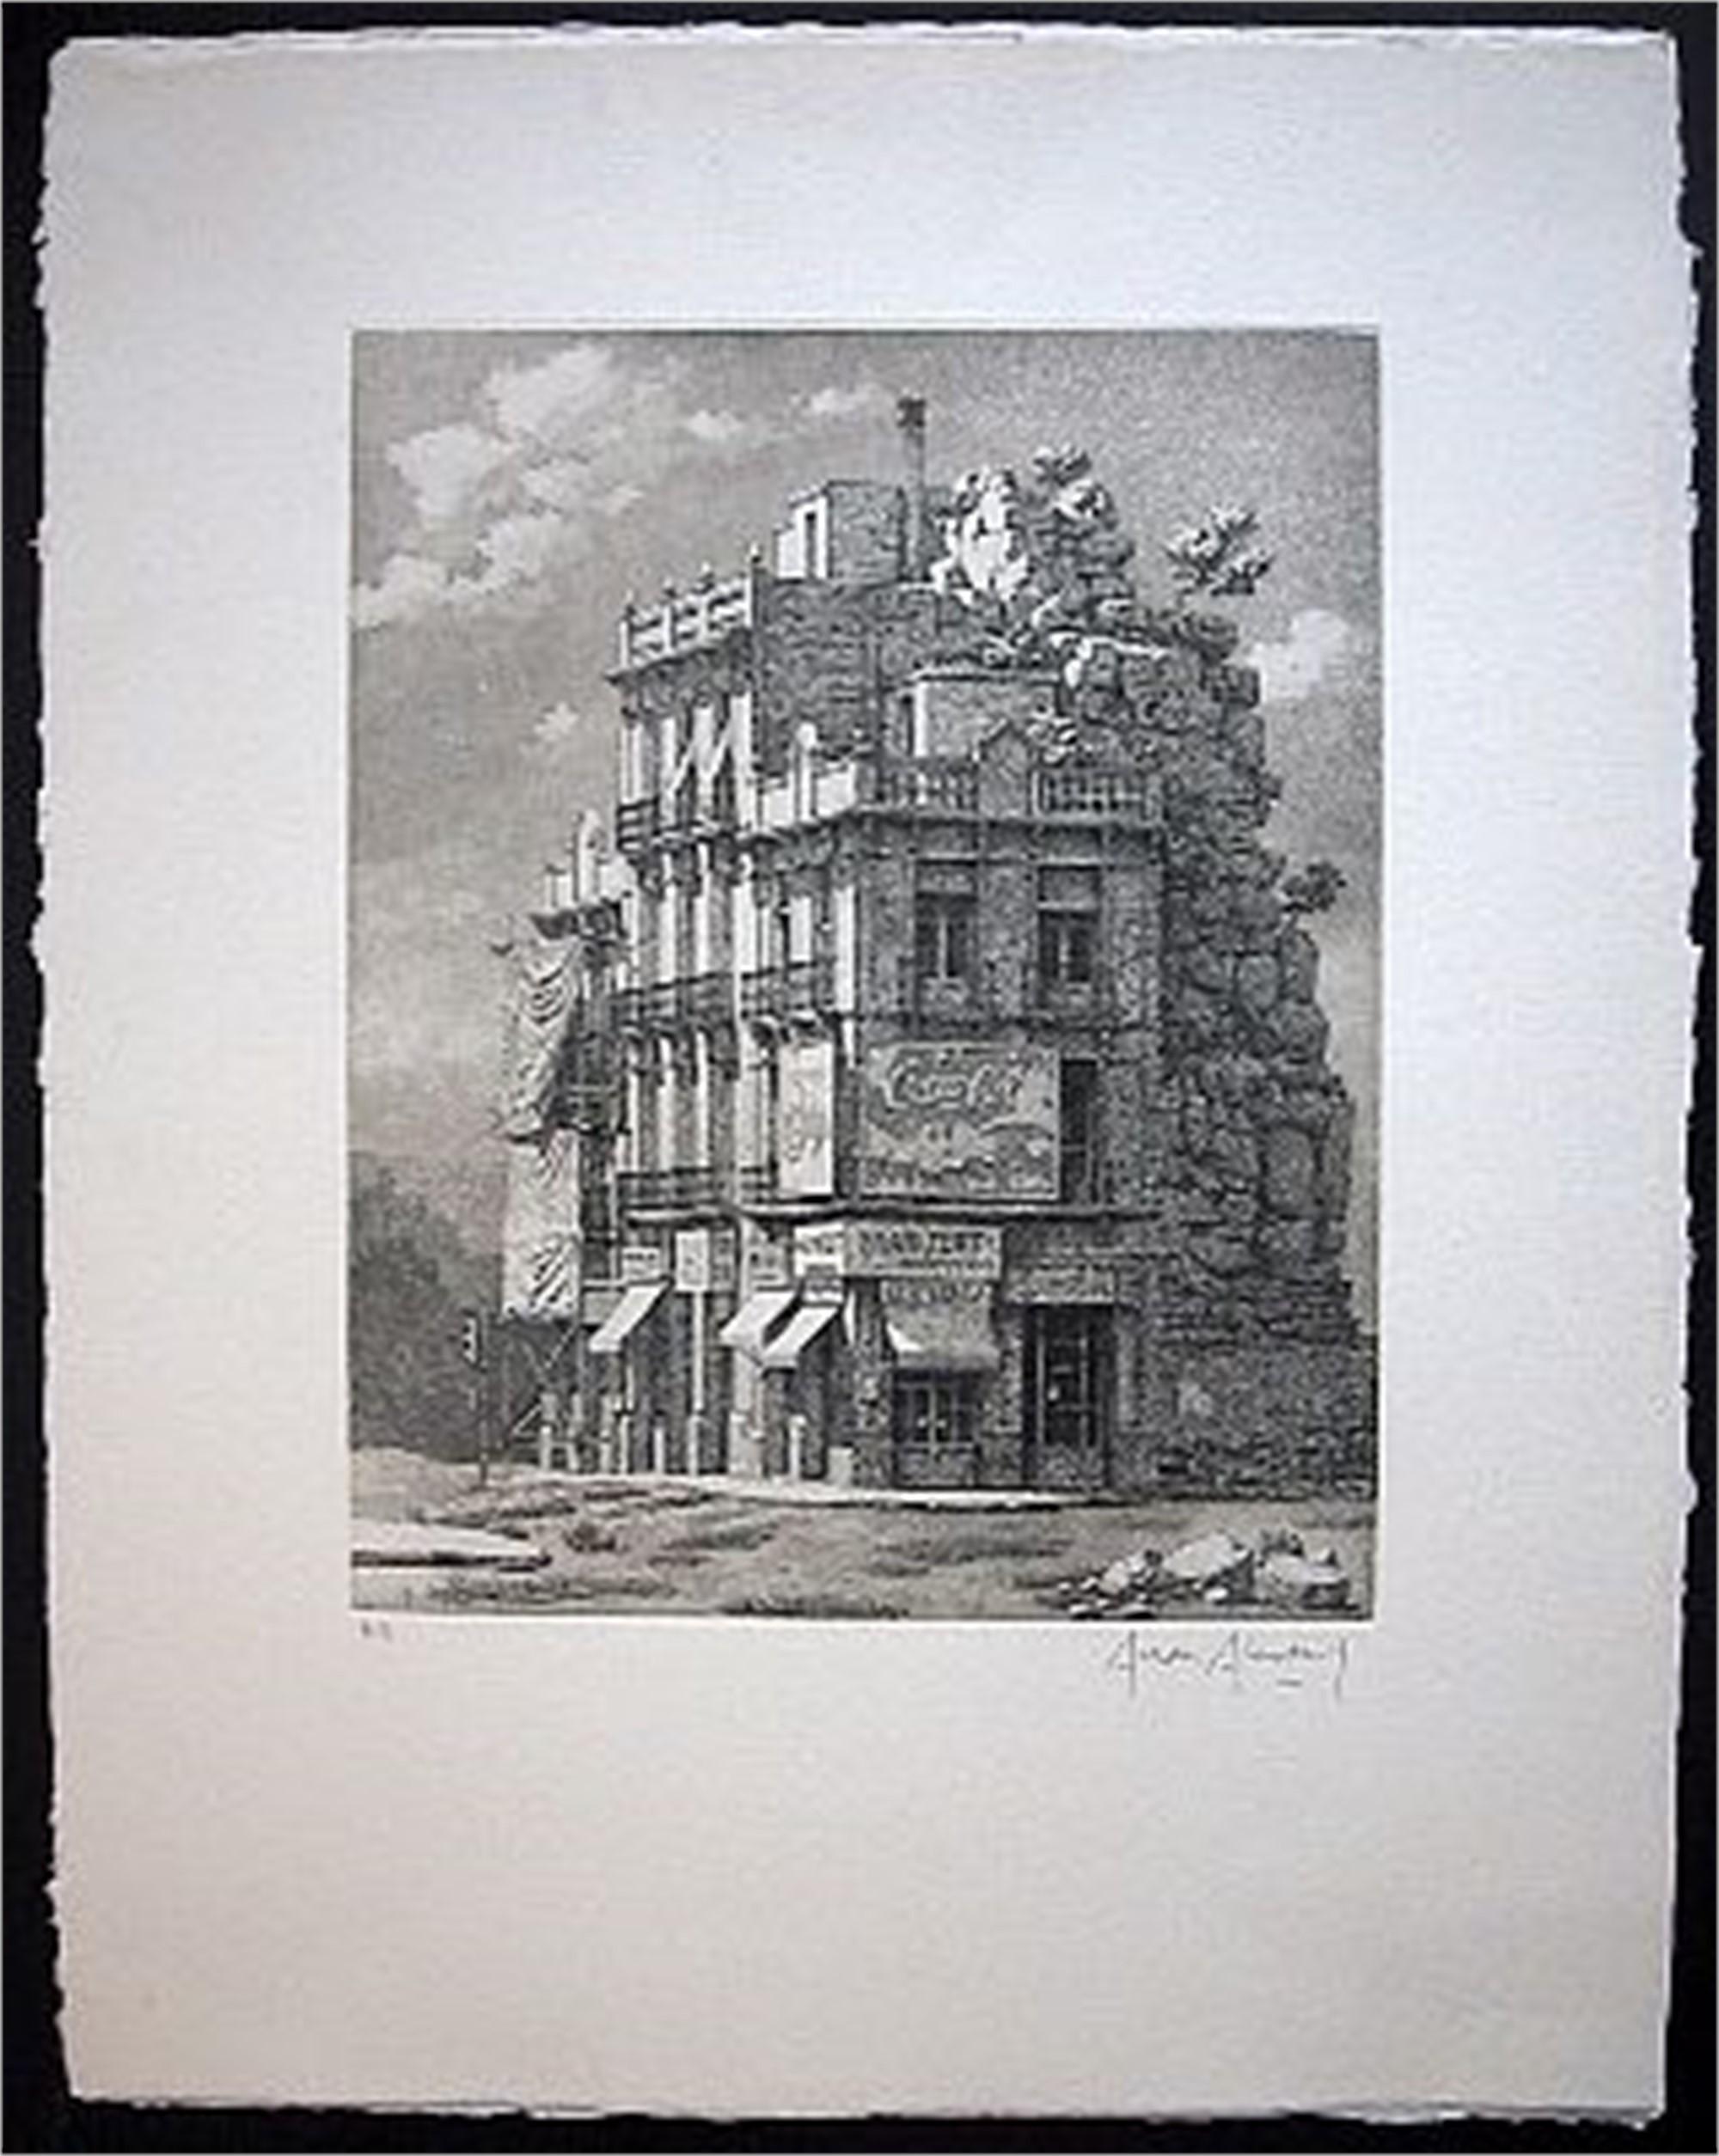 The Corner by Arnau Alemany